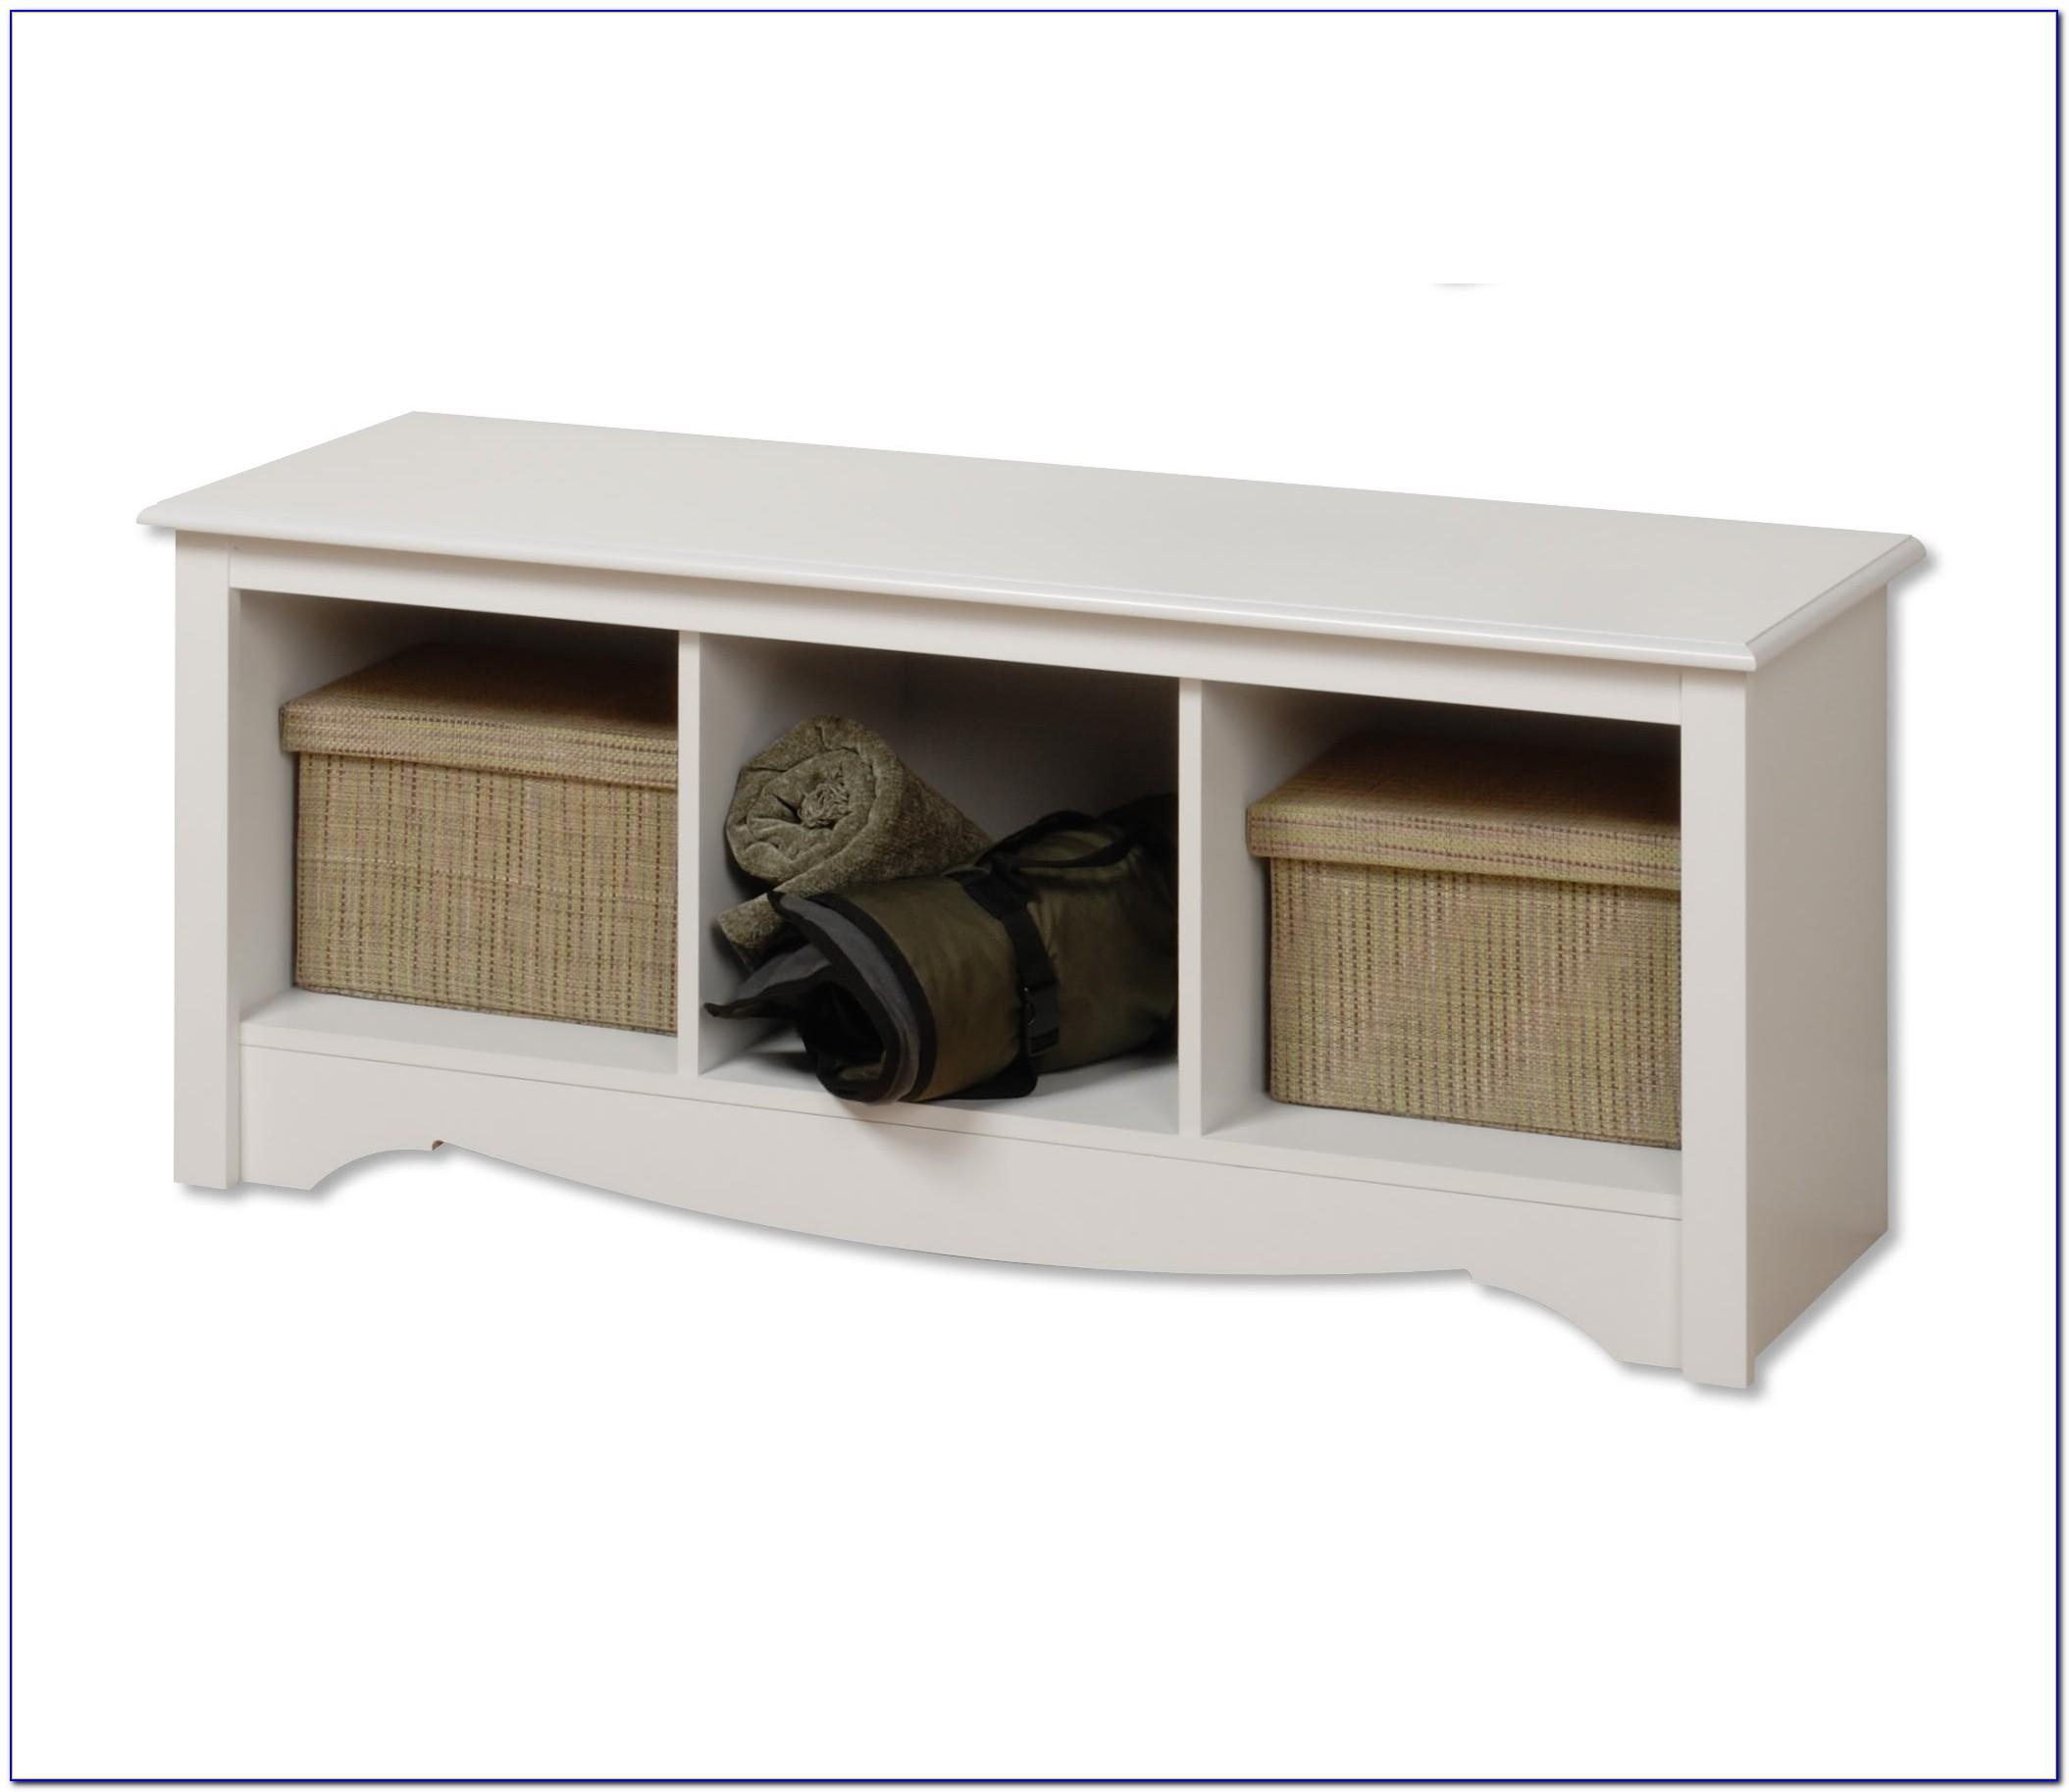 Espresso Storage Bench With Seat And Cubby Storage